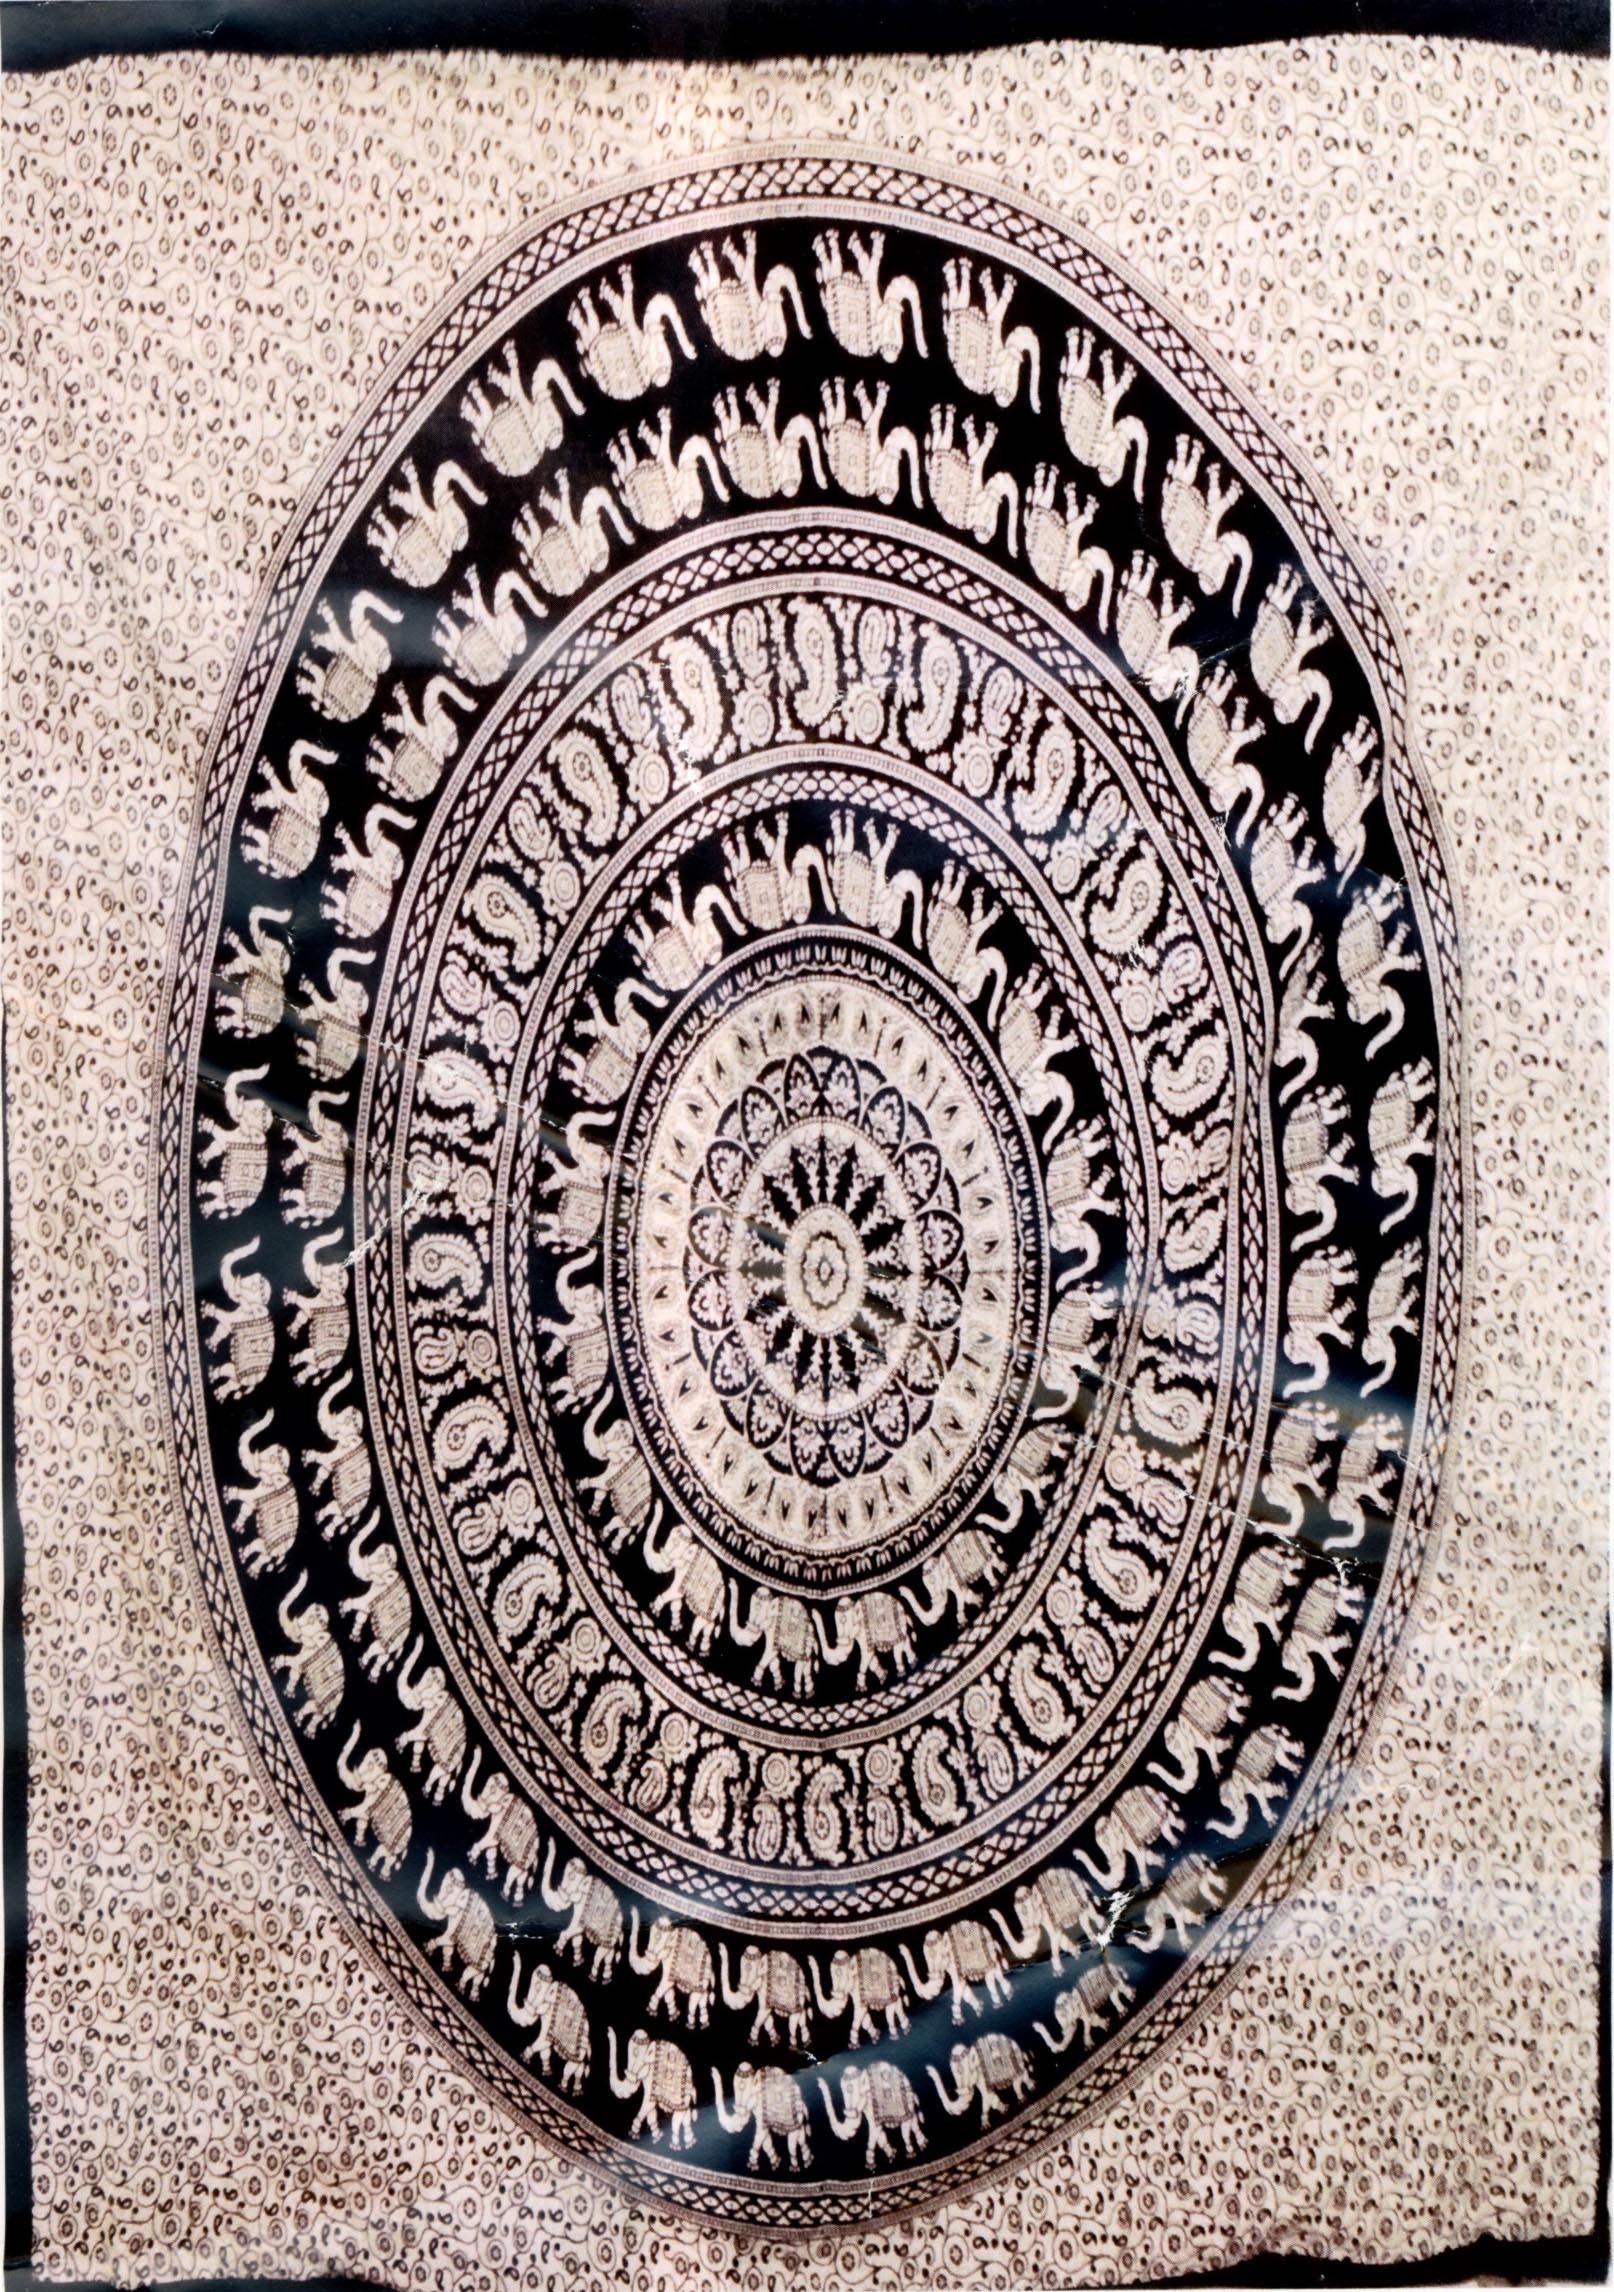 BIG INDIAN TOWELS TI-G01-45 - Etnika Slog d.o.o.